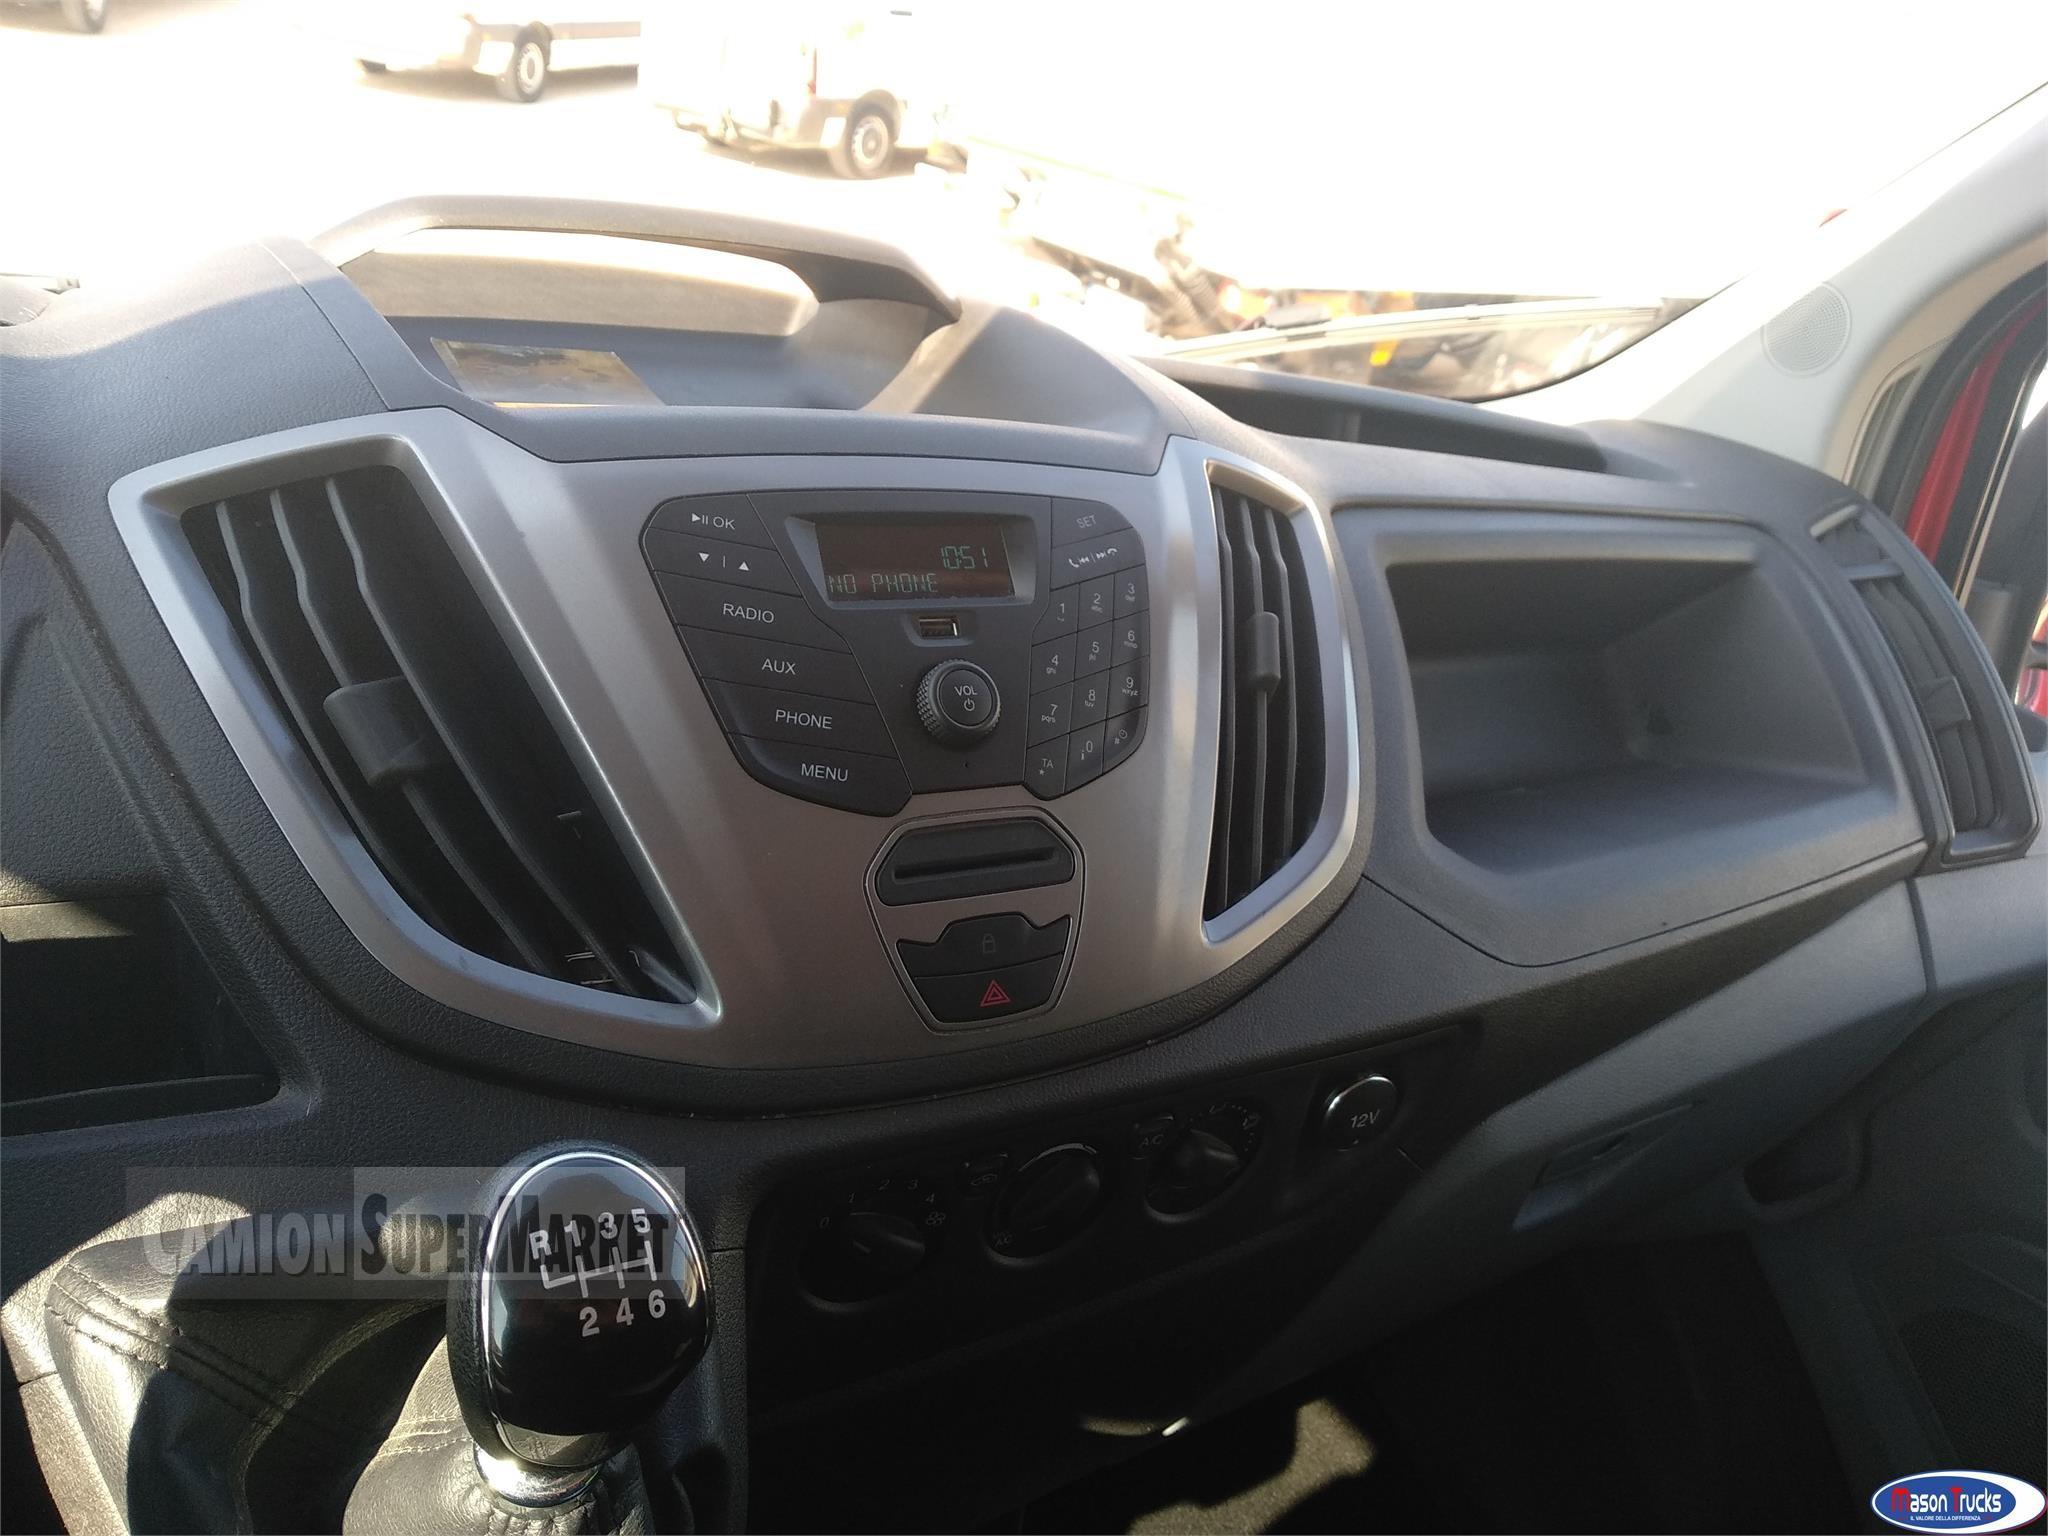 Ford TRANSIT Usato 2017 Veneto